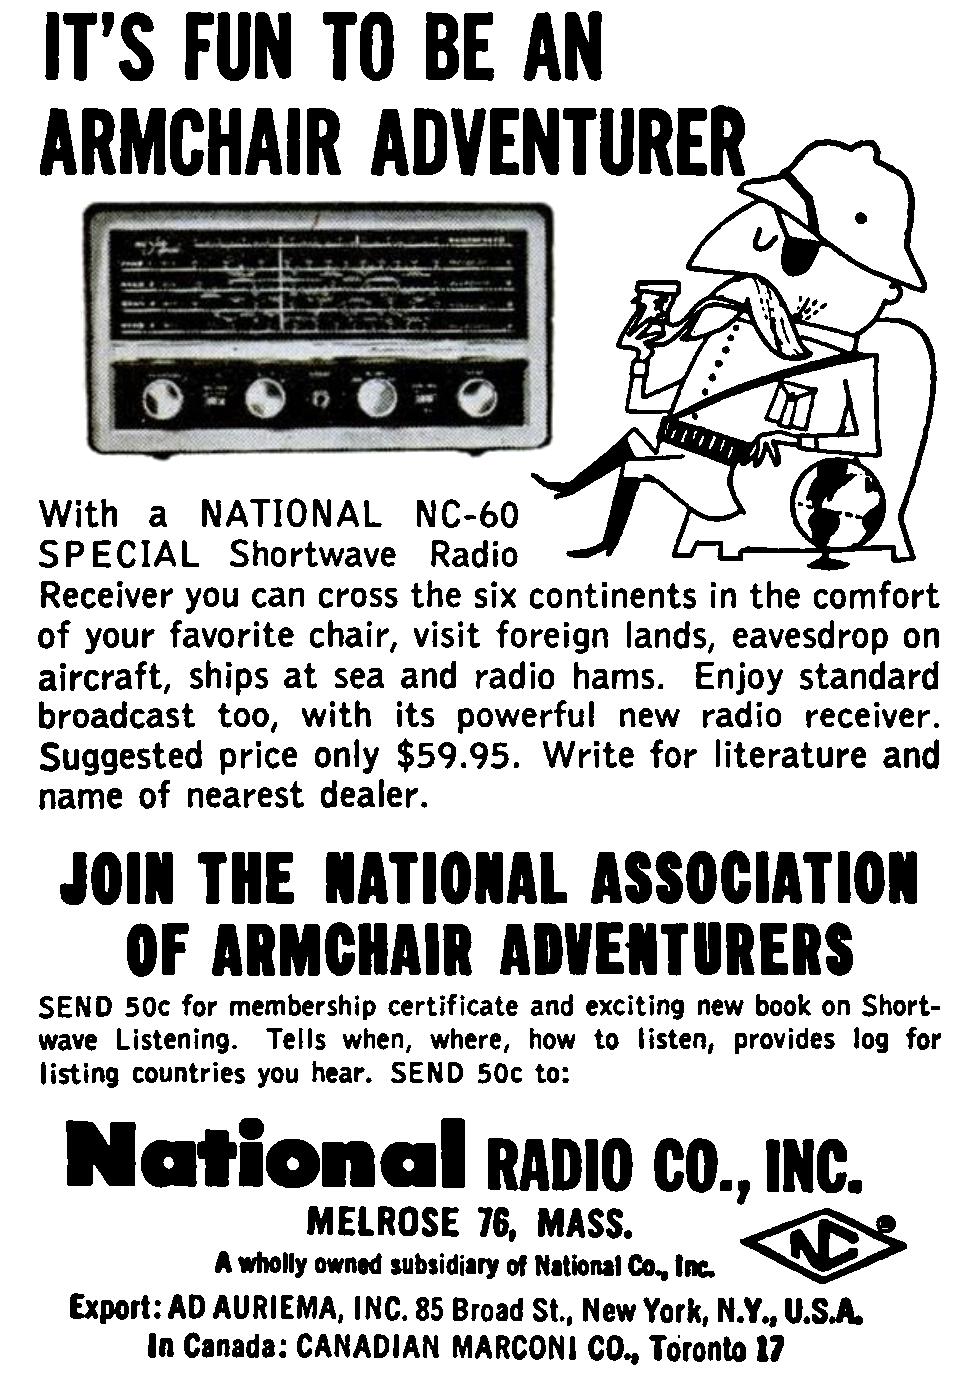 Guest Post: The National Association of Armchair Adventurers